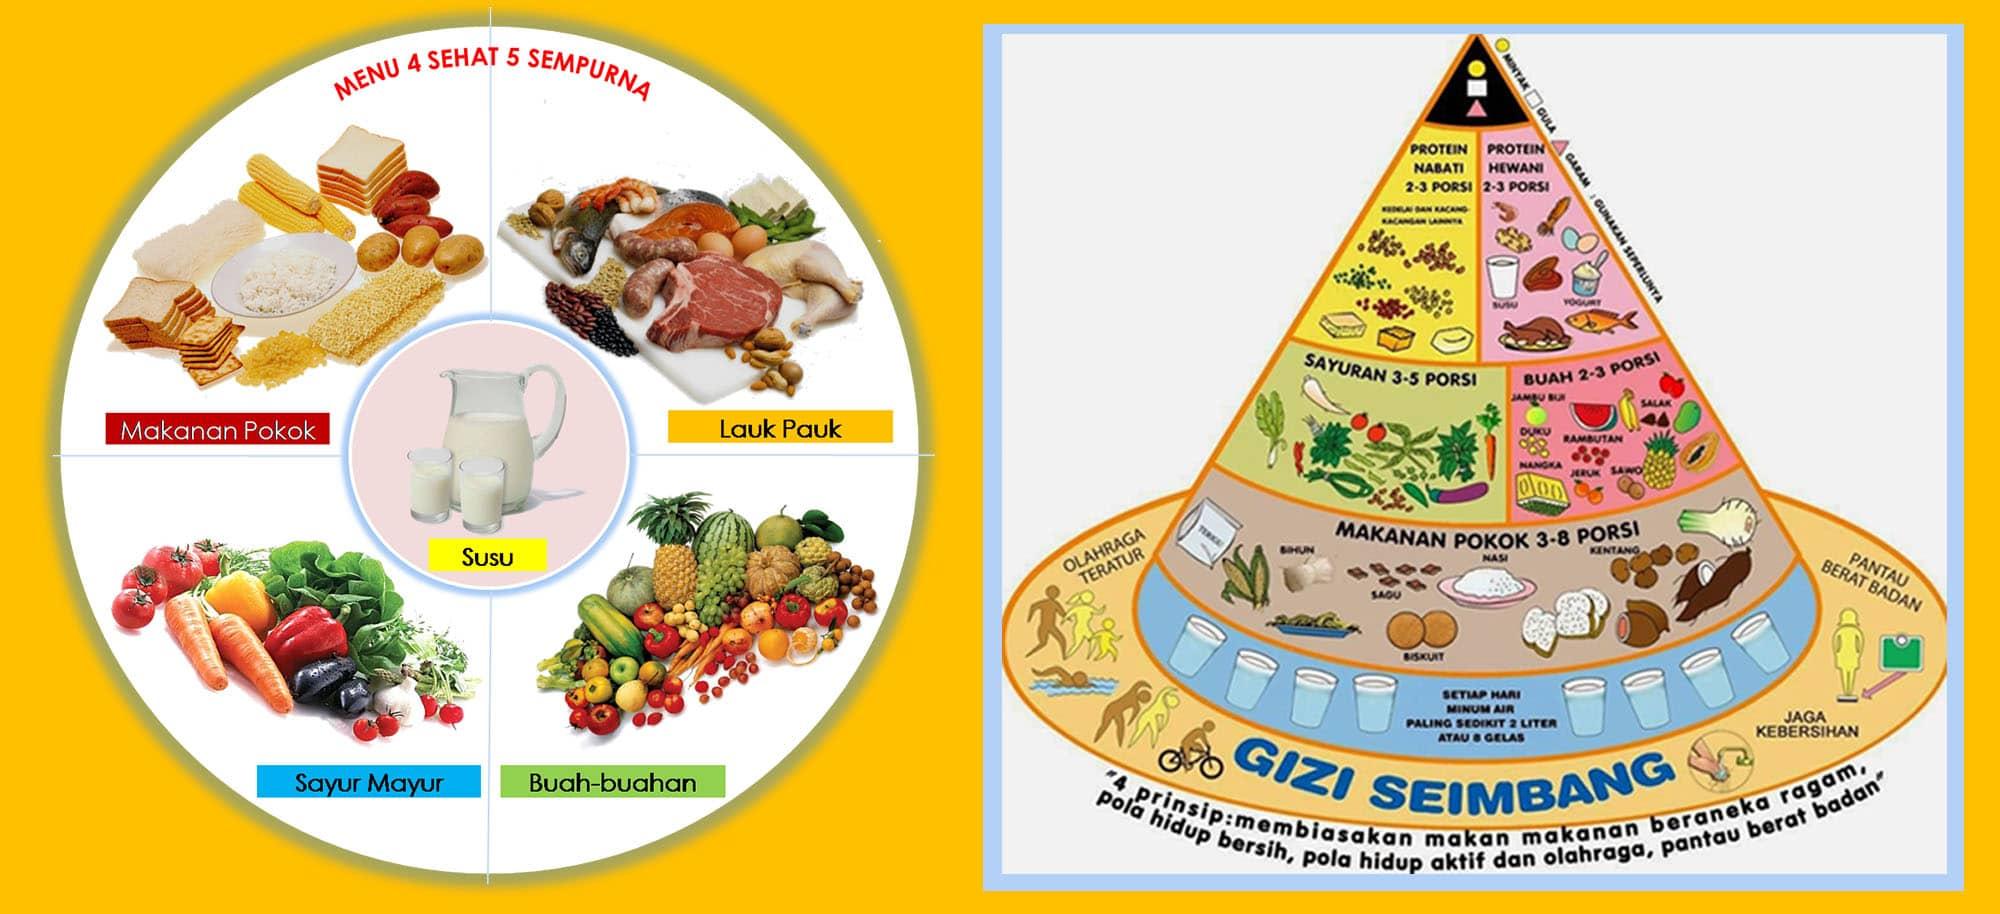 Piramida Makanan 4 Sehat 5 Sempurna Terlengkap Biology Co Id